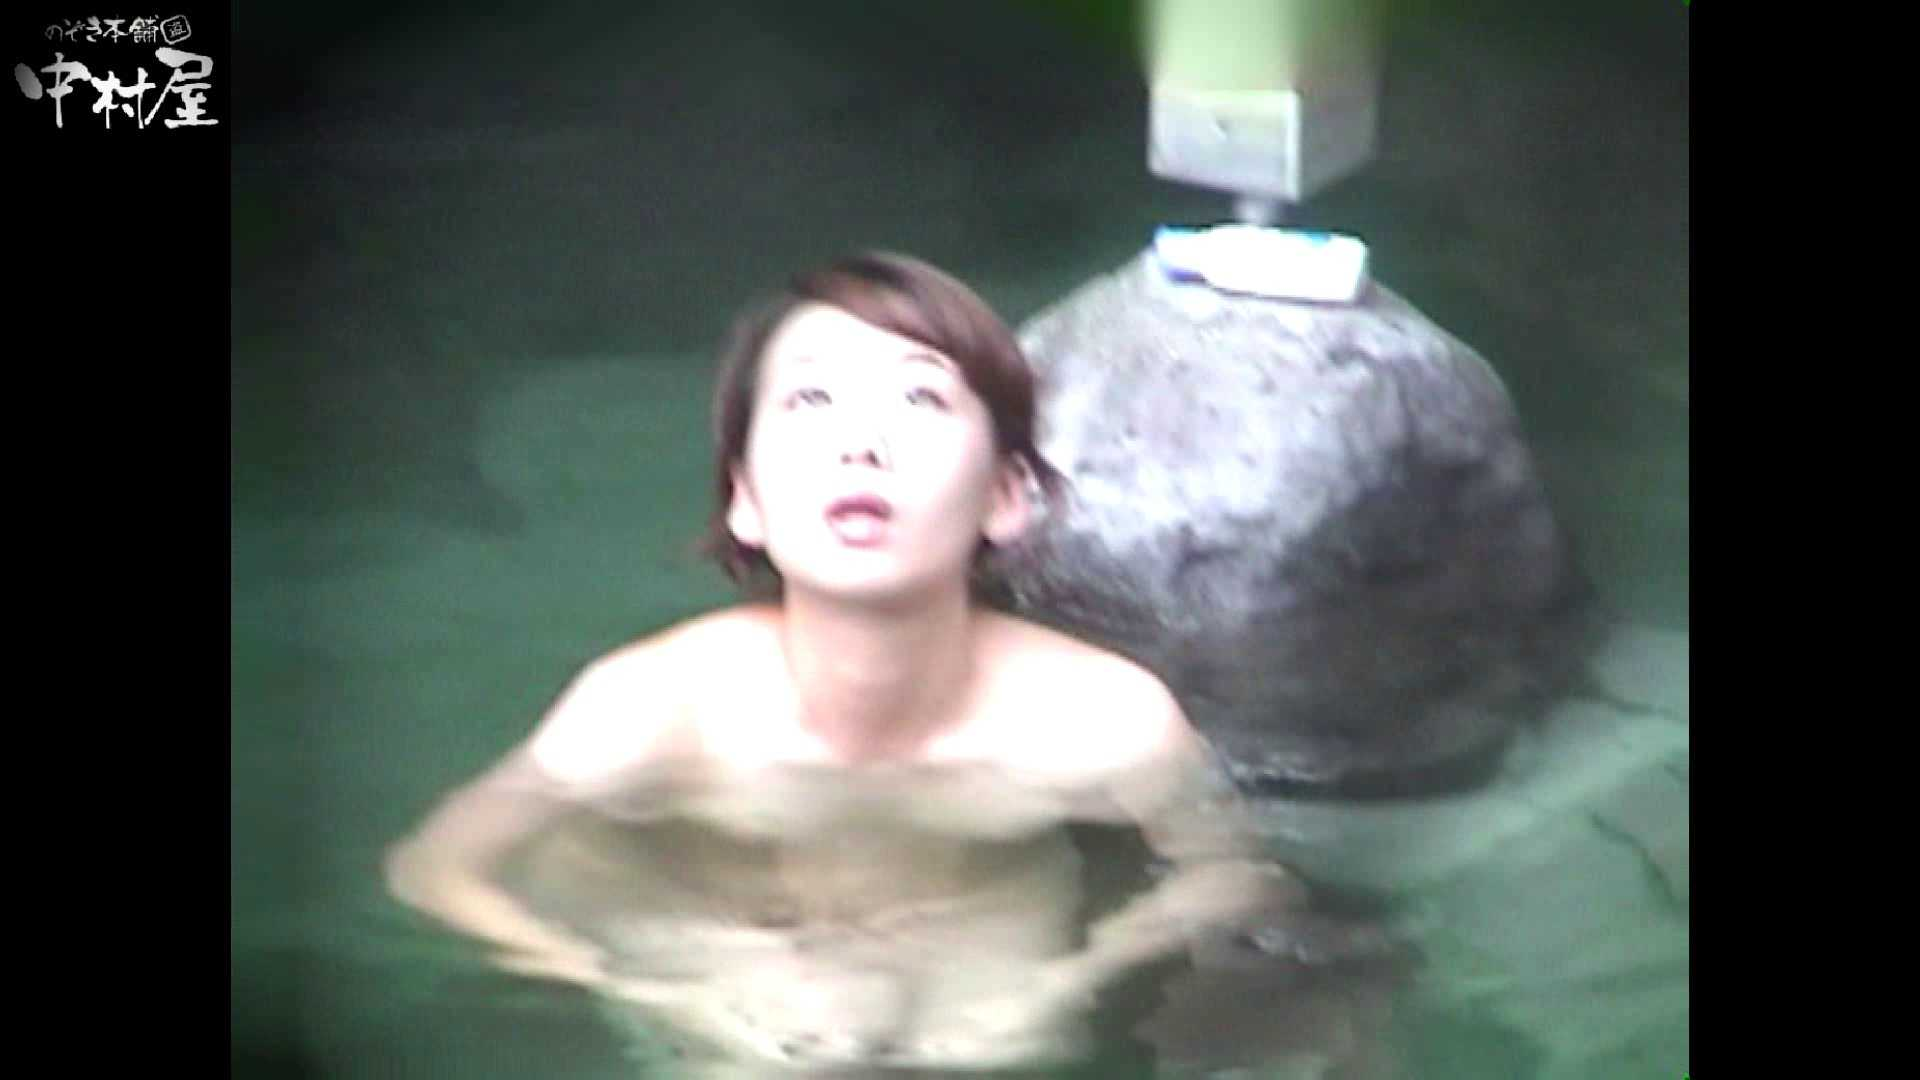 Aquaな露天風呂Vol.951 露天風呂 隠し撮りオマンコ動画紹介 80連発 32